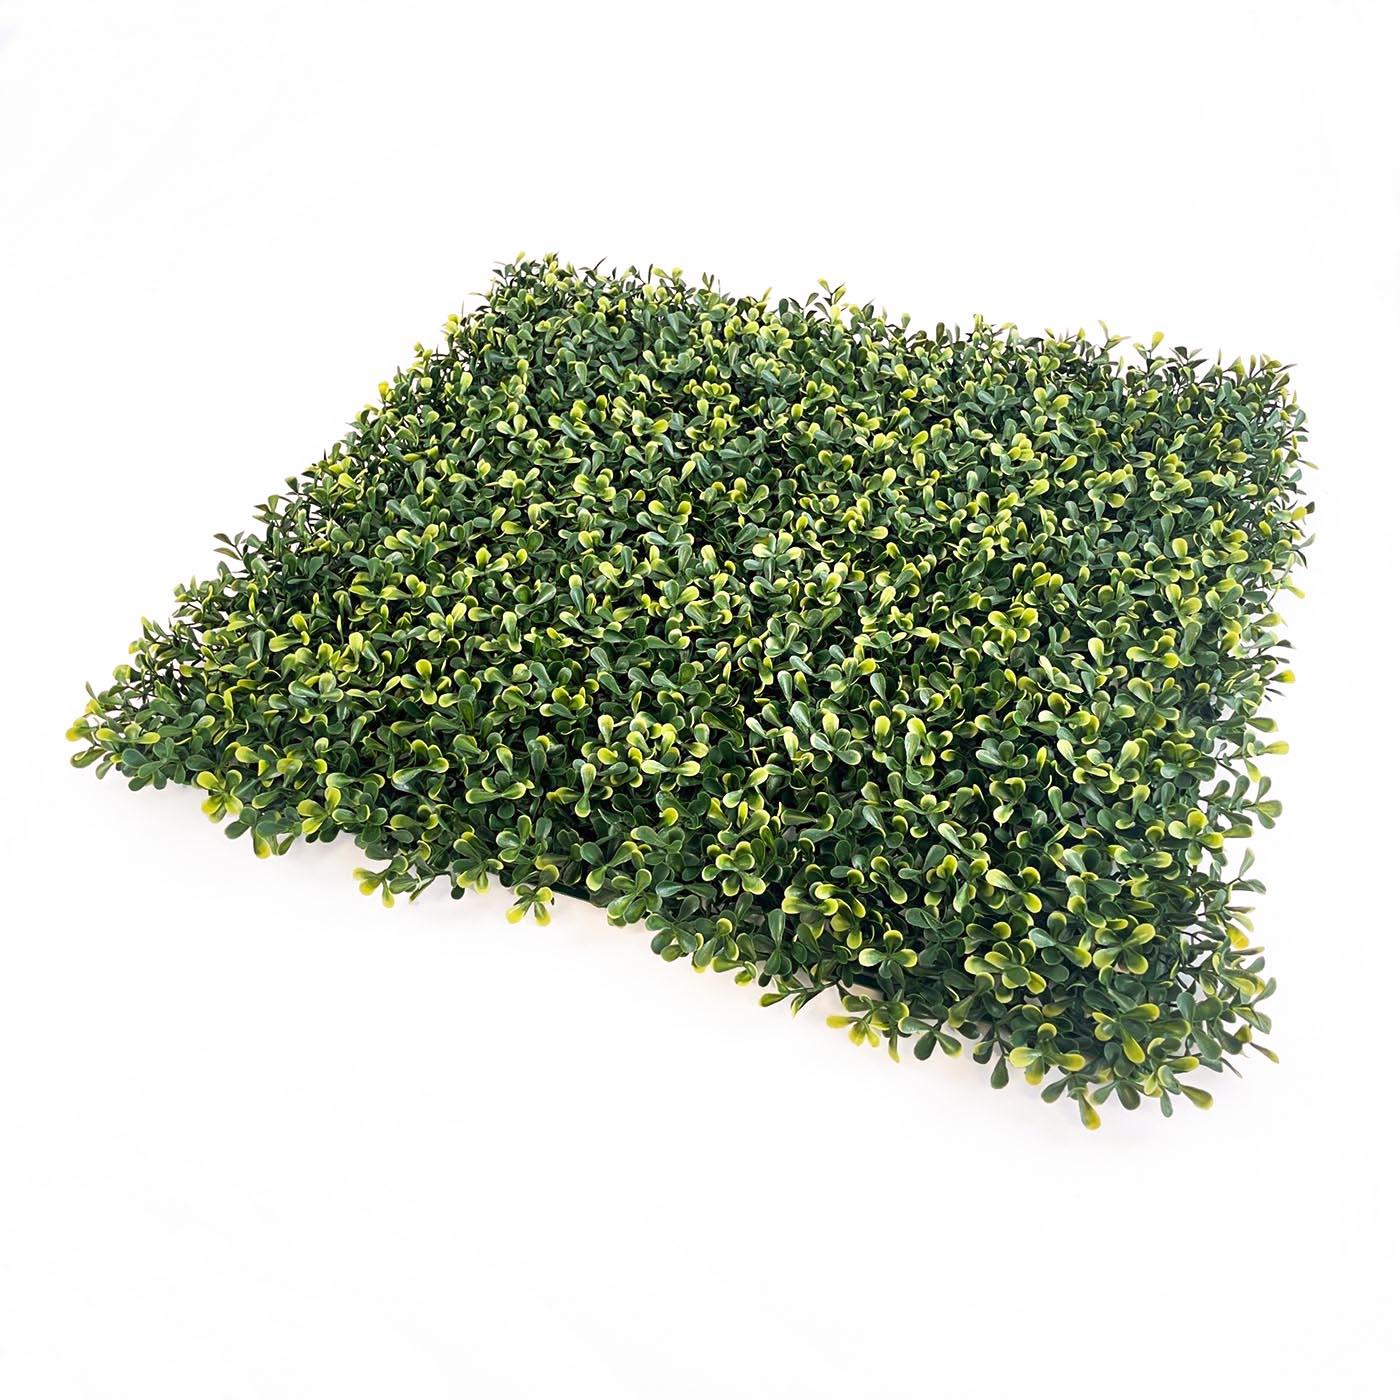 Topiary hedge tile angled view